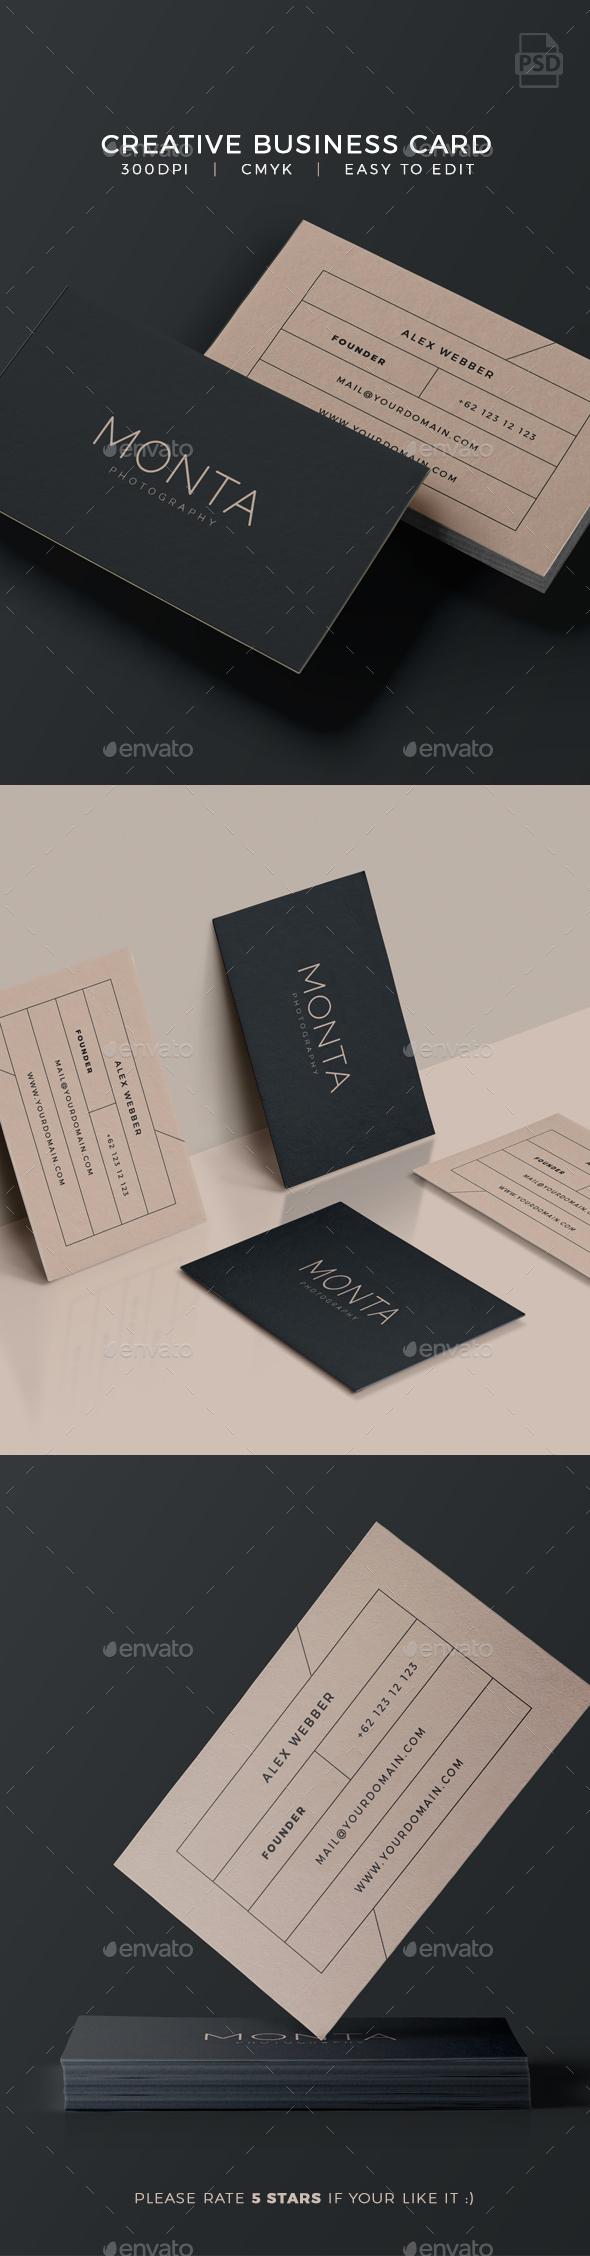 Creative Business Card - Monta - Creative Business Cards